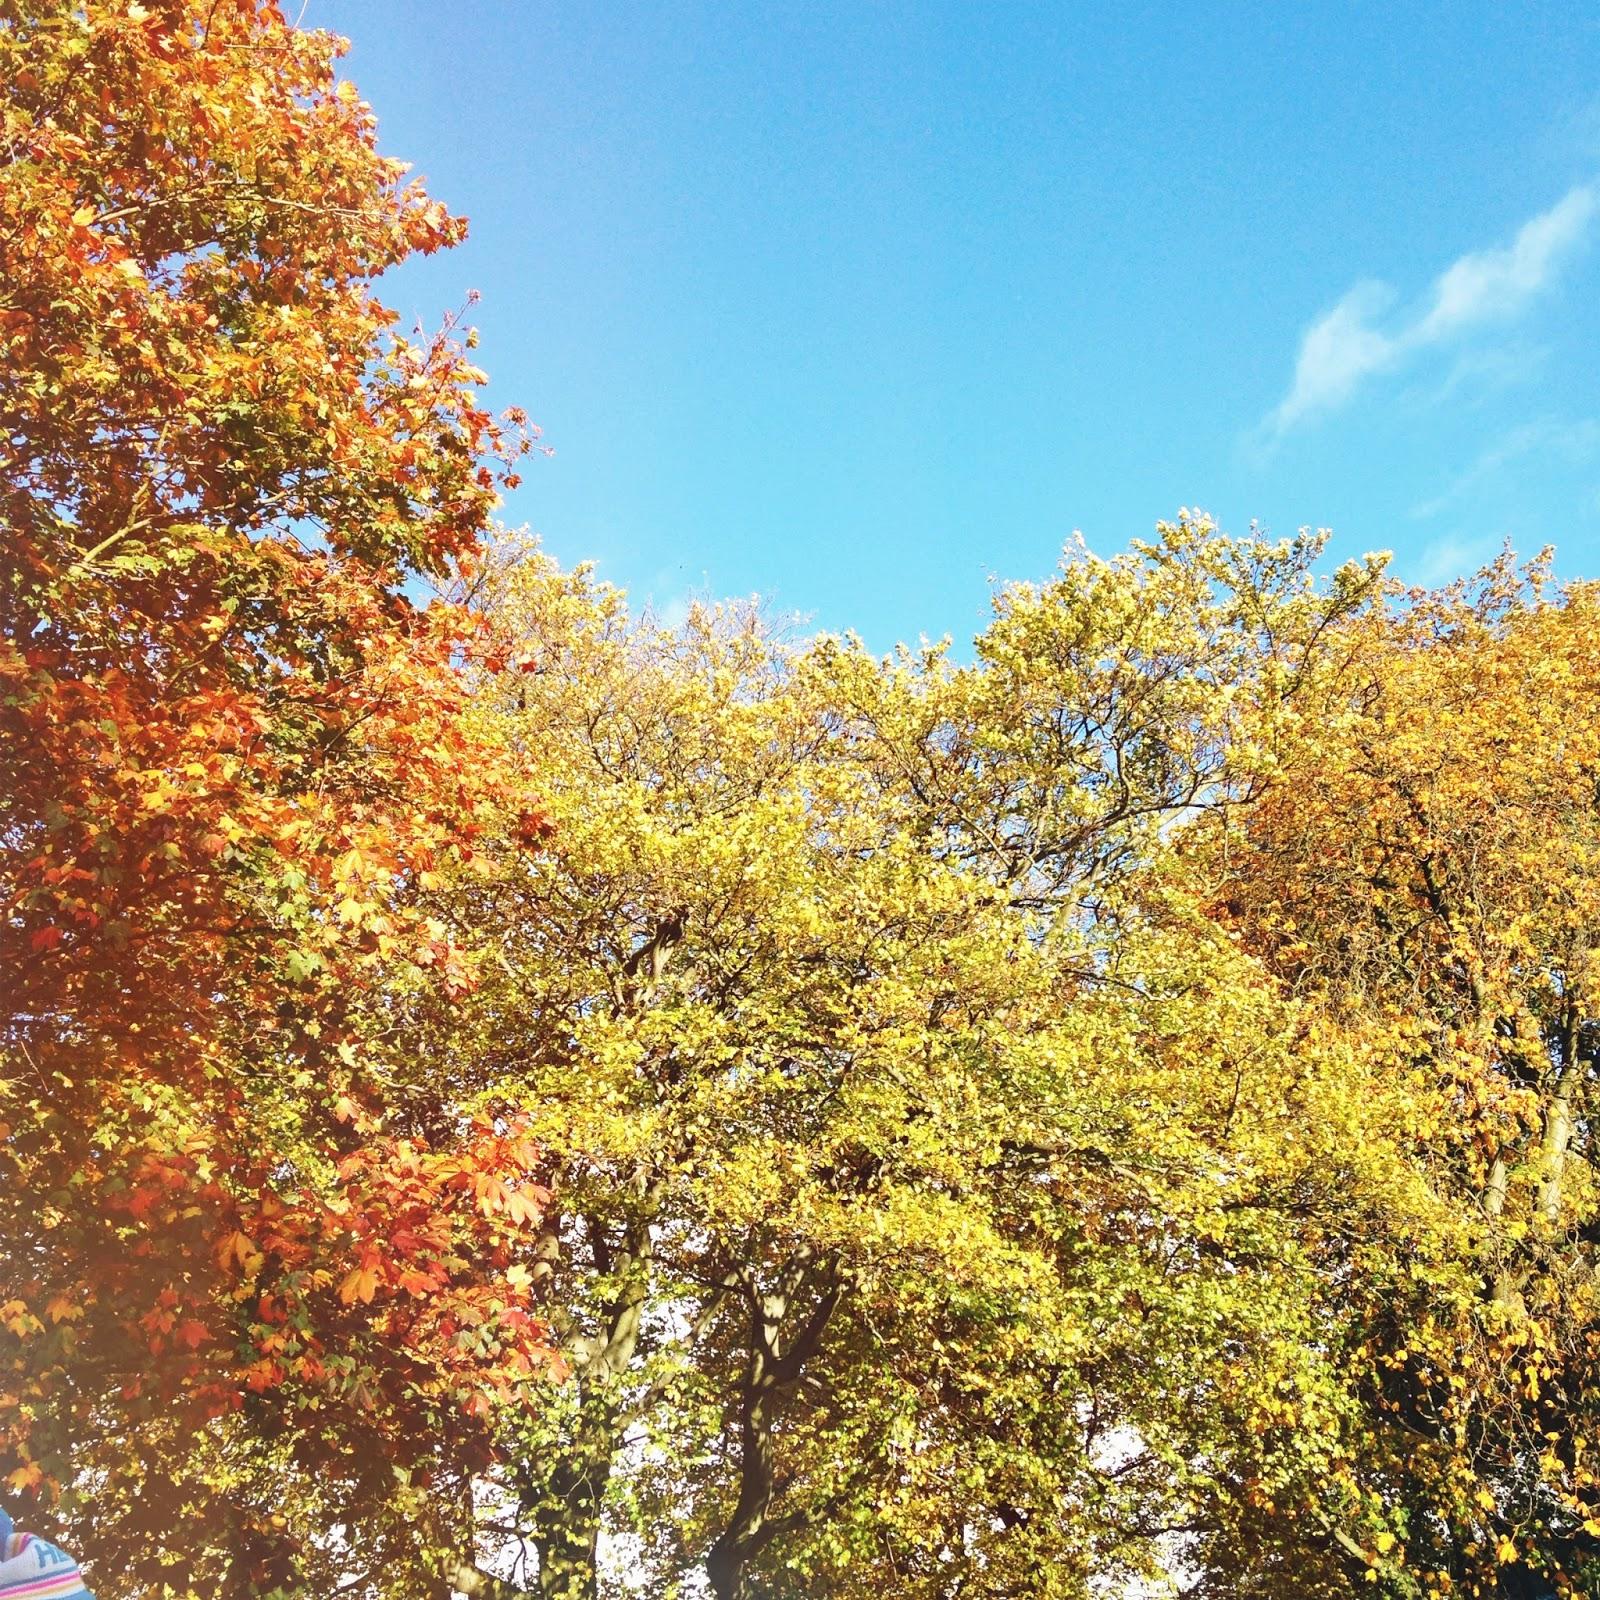 Autumn in england,